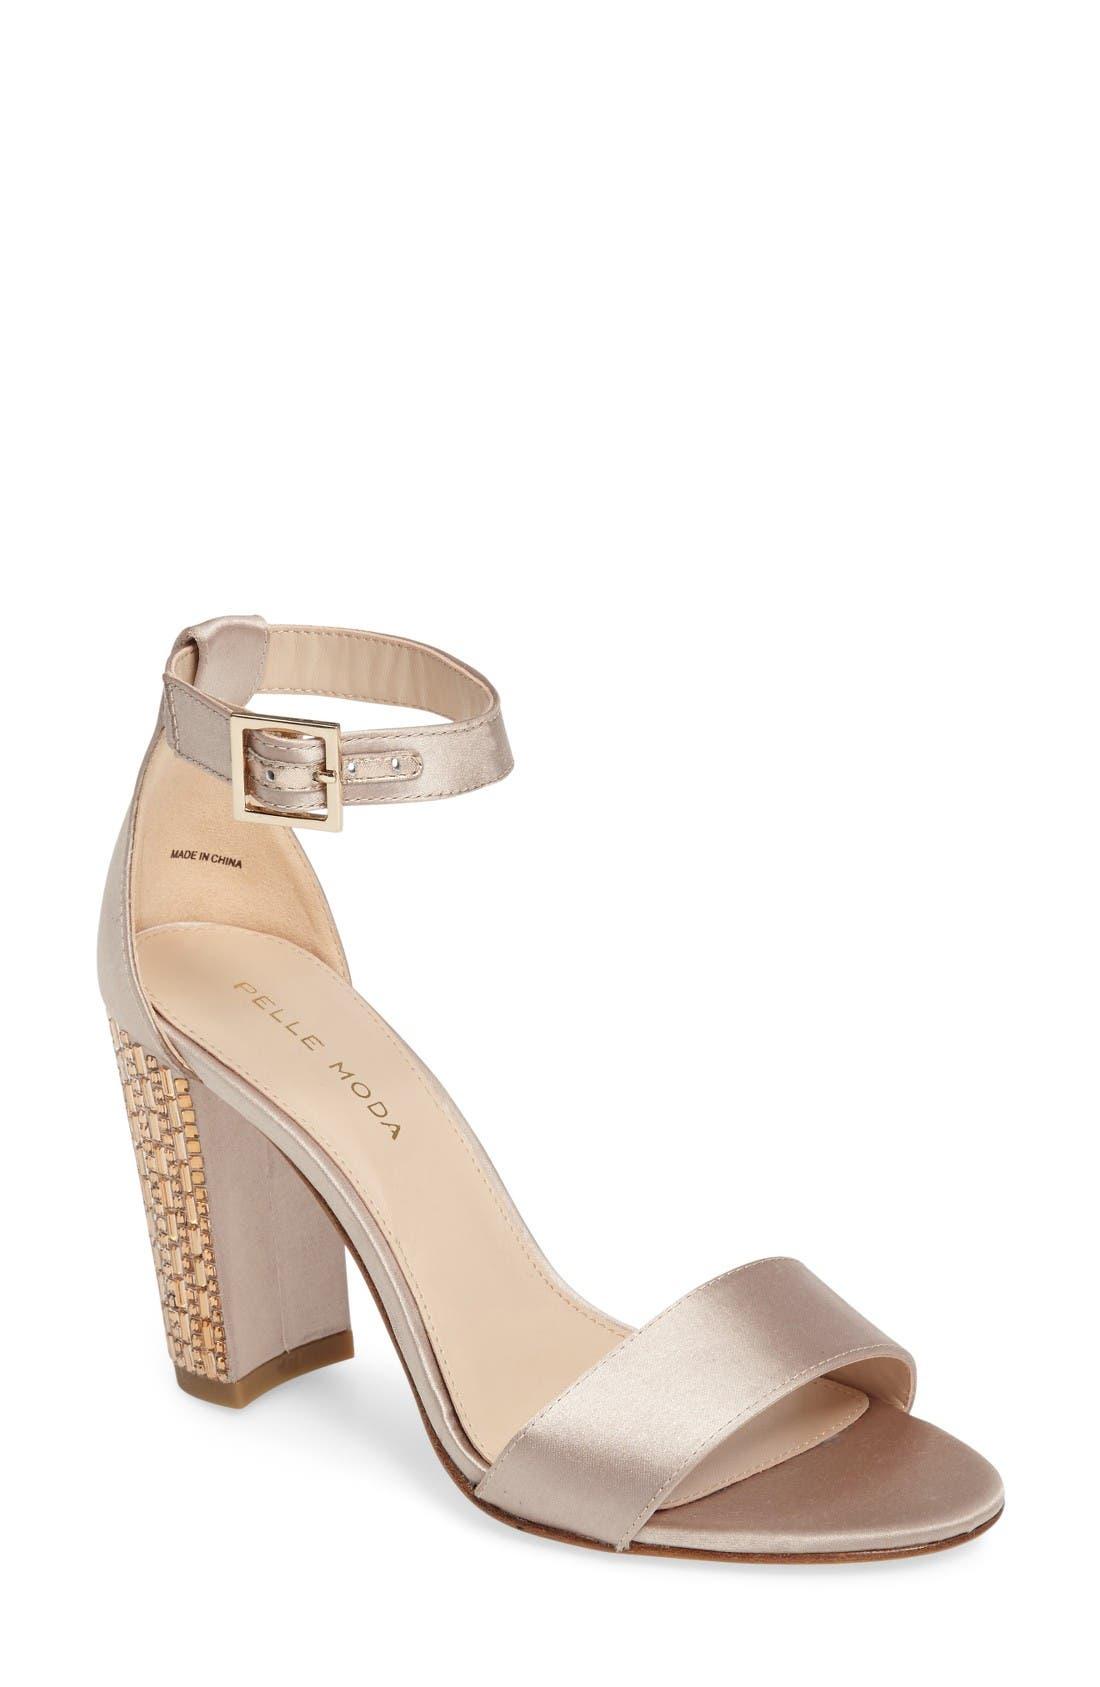 Pelle Moda Bonnie 3 Embellished Ankle Strap Sandal (Women)